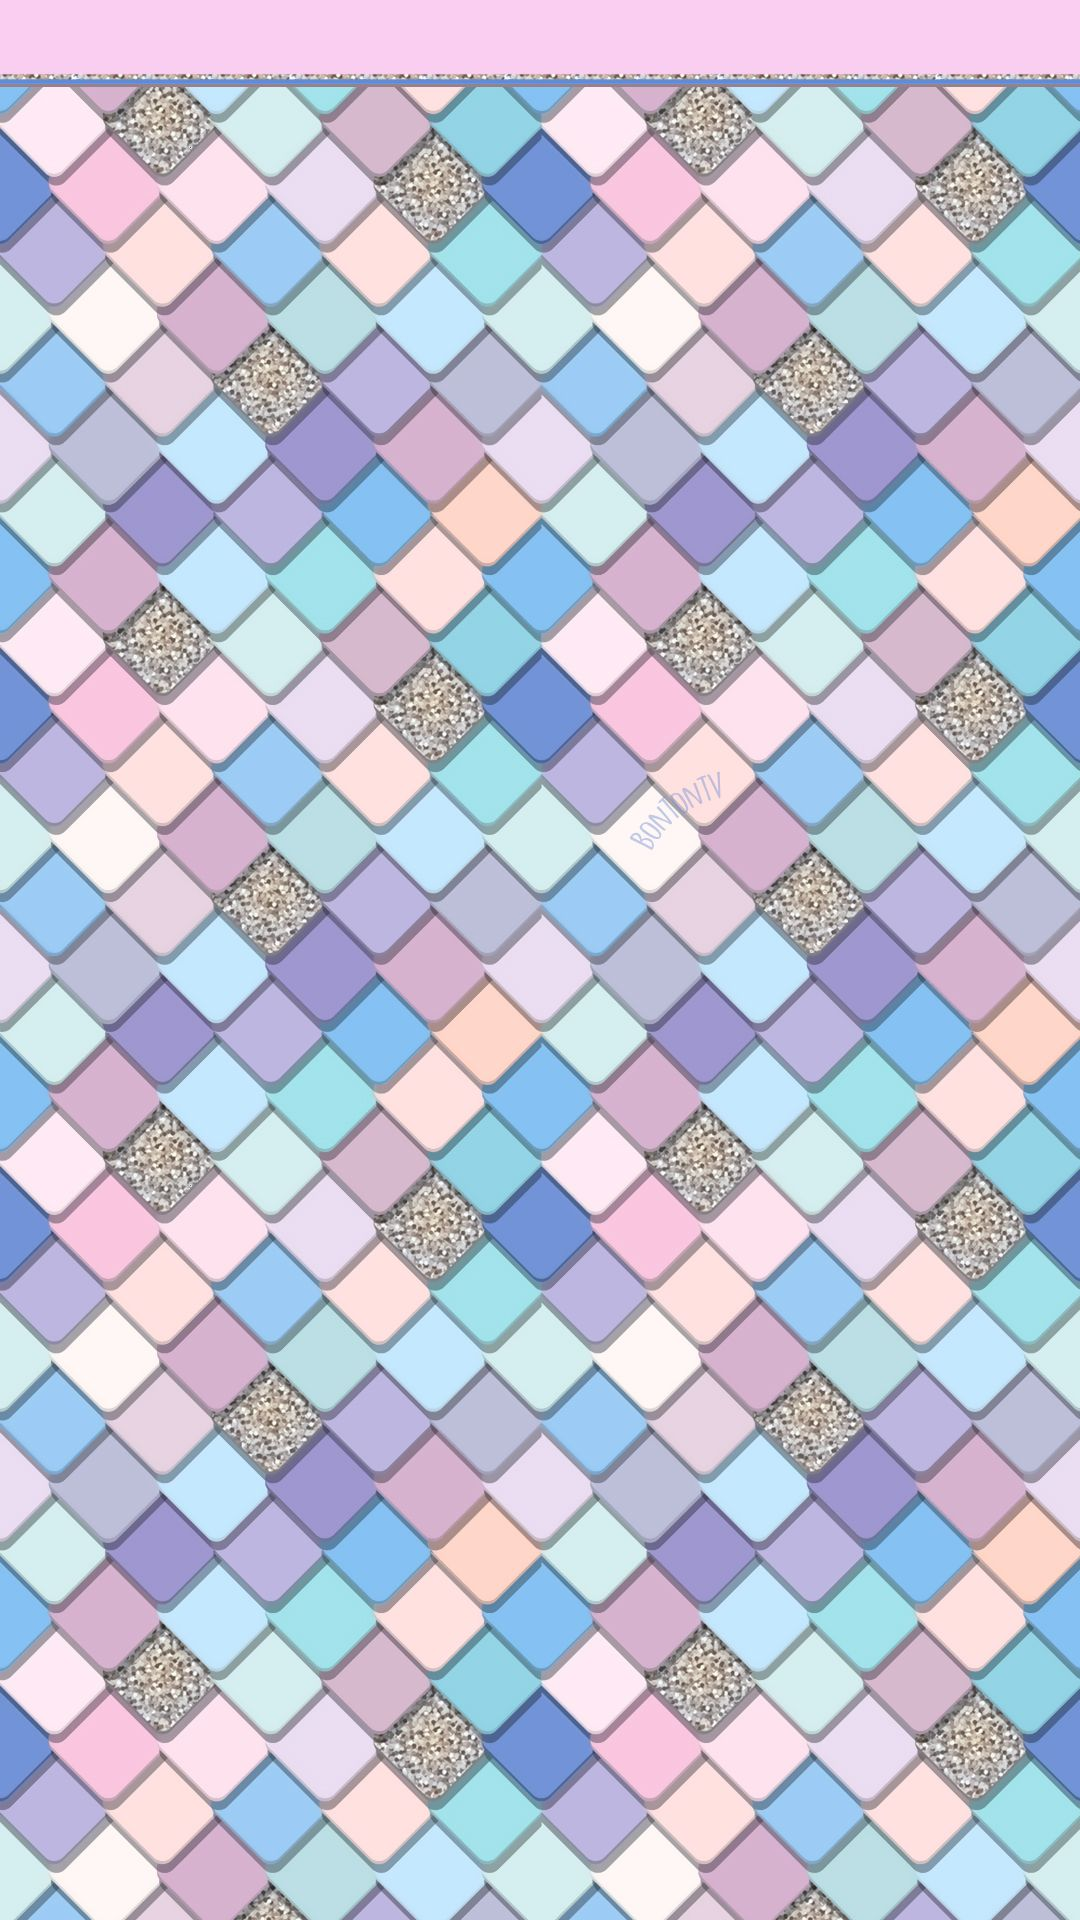 Phone Wallpapers Hd Colorful Pastel Mermaid Tiles By